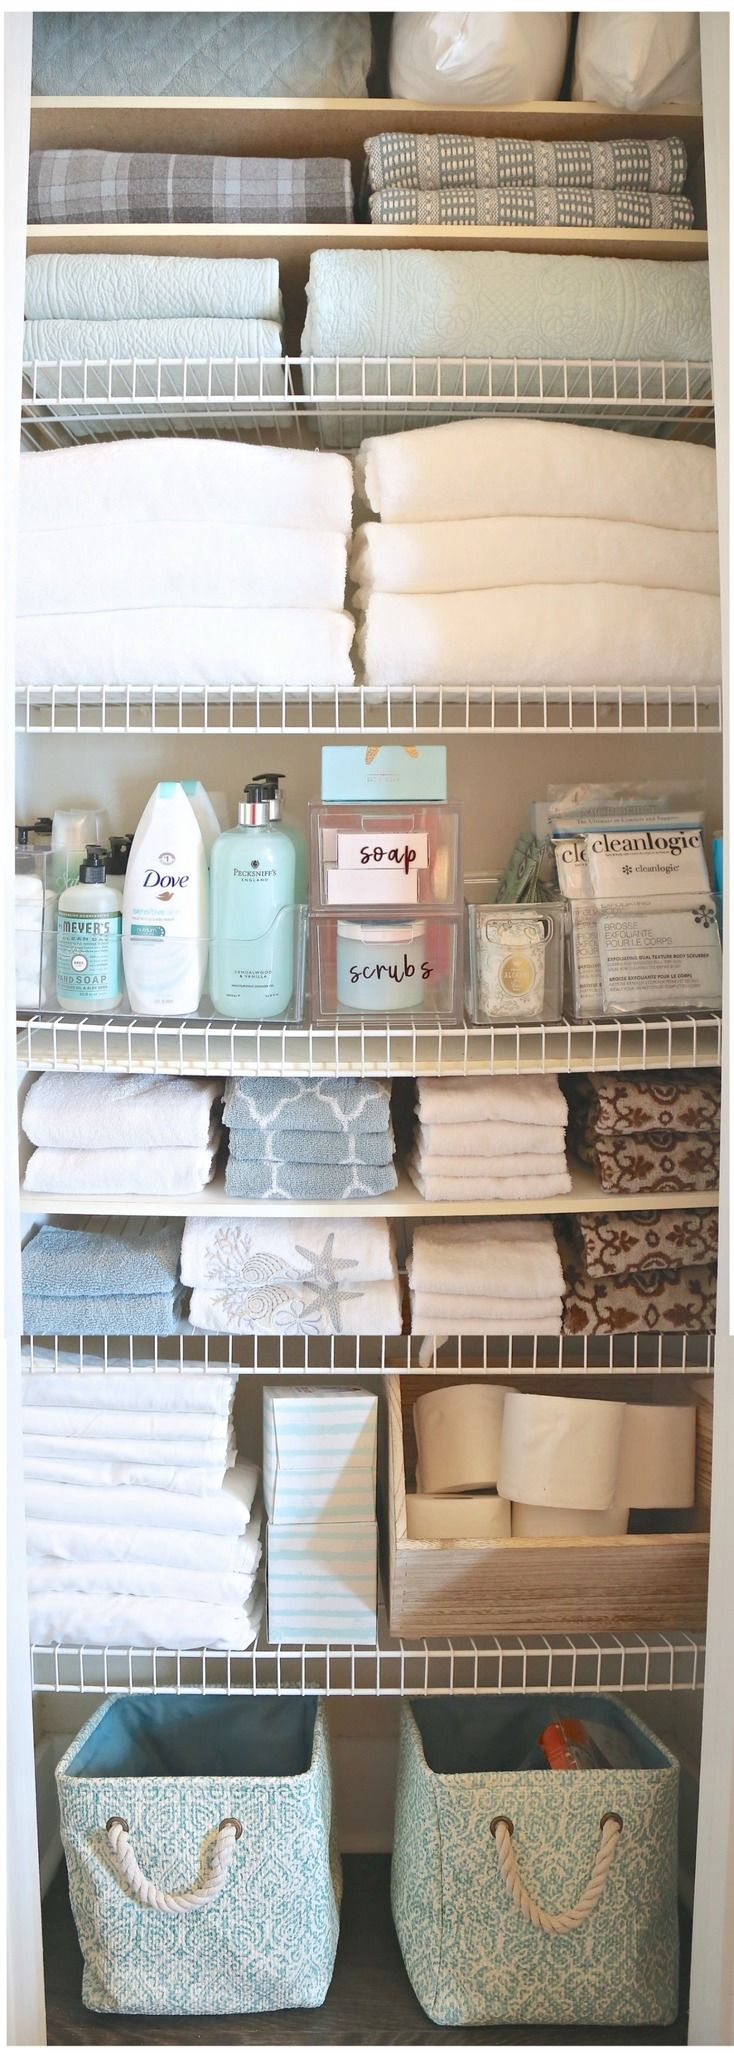 Linen Closet Organizing: Create More Storage  Closet organization ...